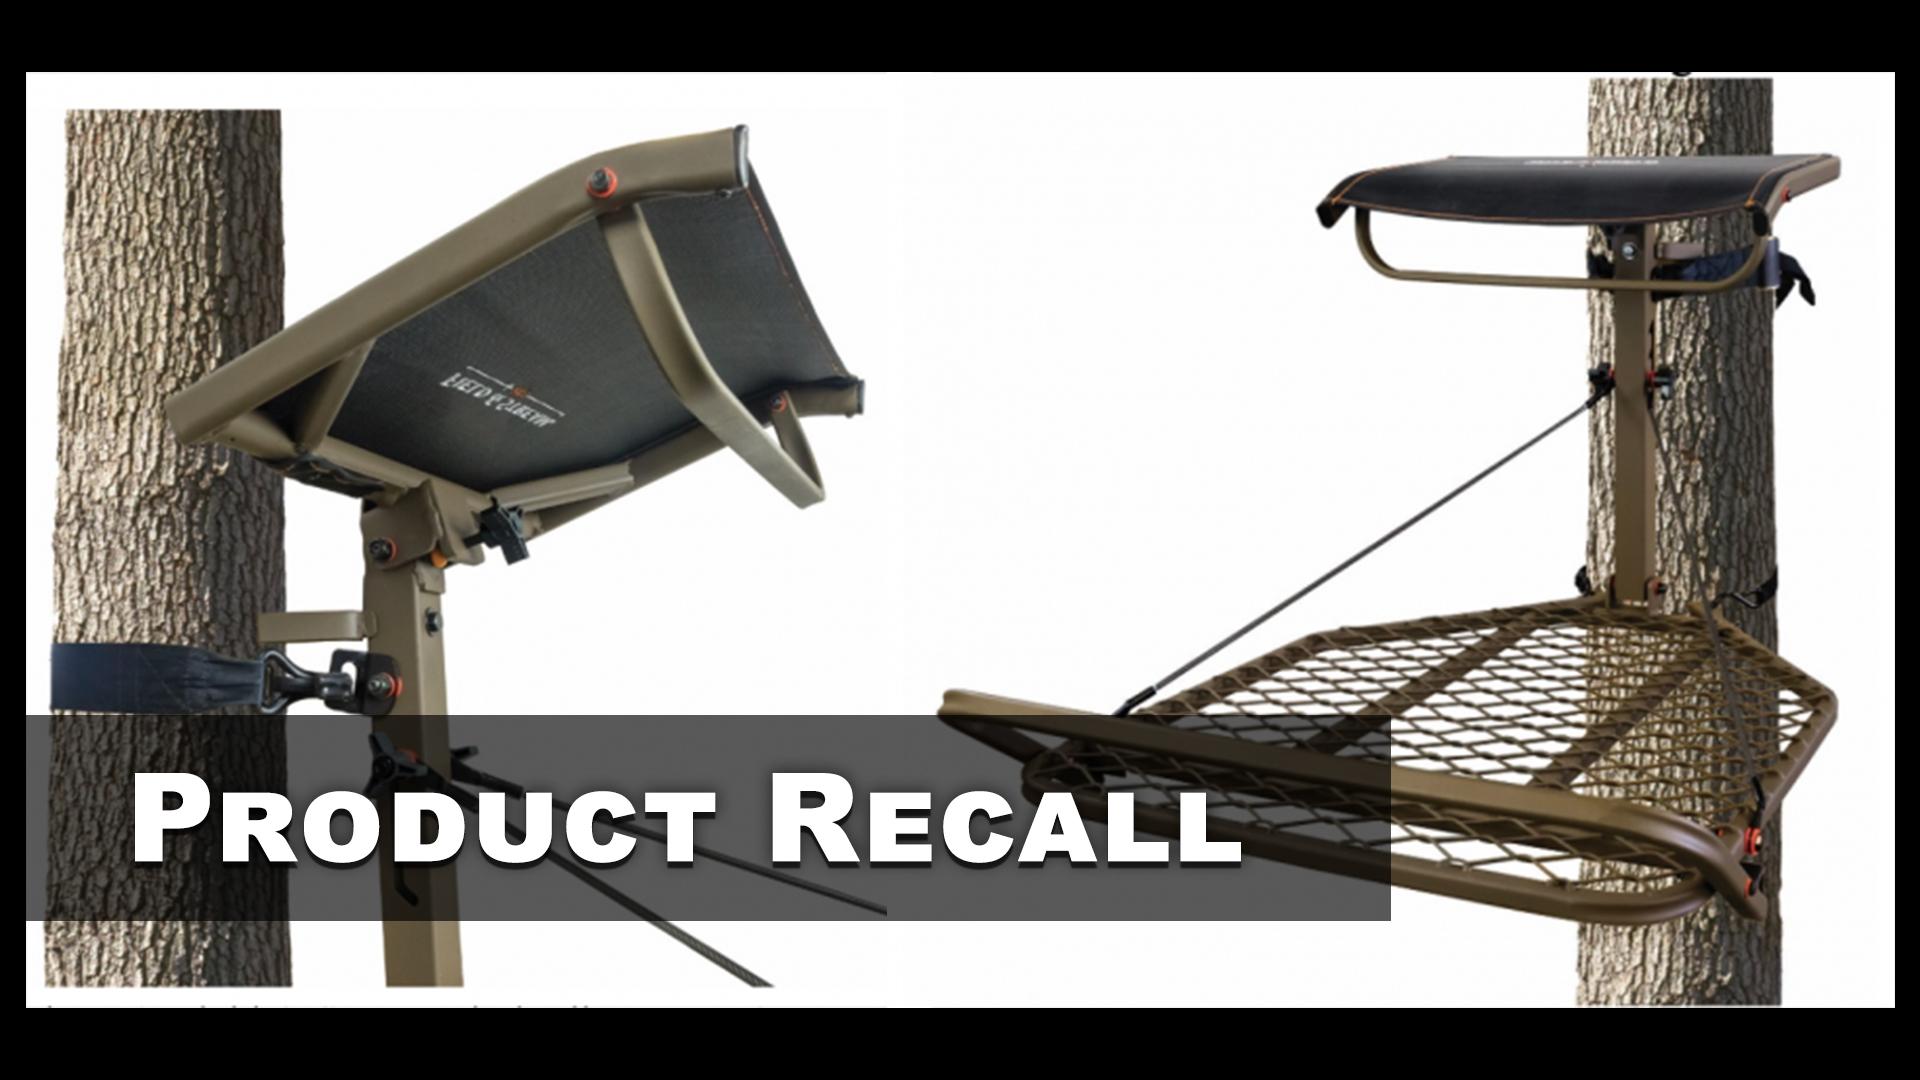 Dick's Product Recall_1555106610498.jpg-159665.jpg